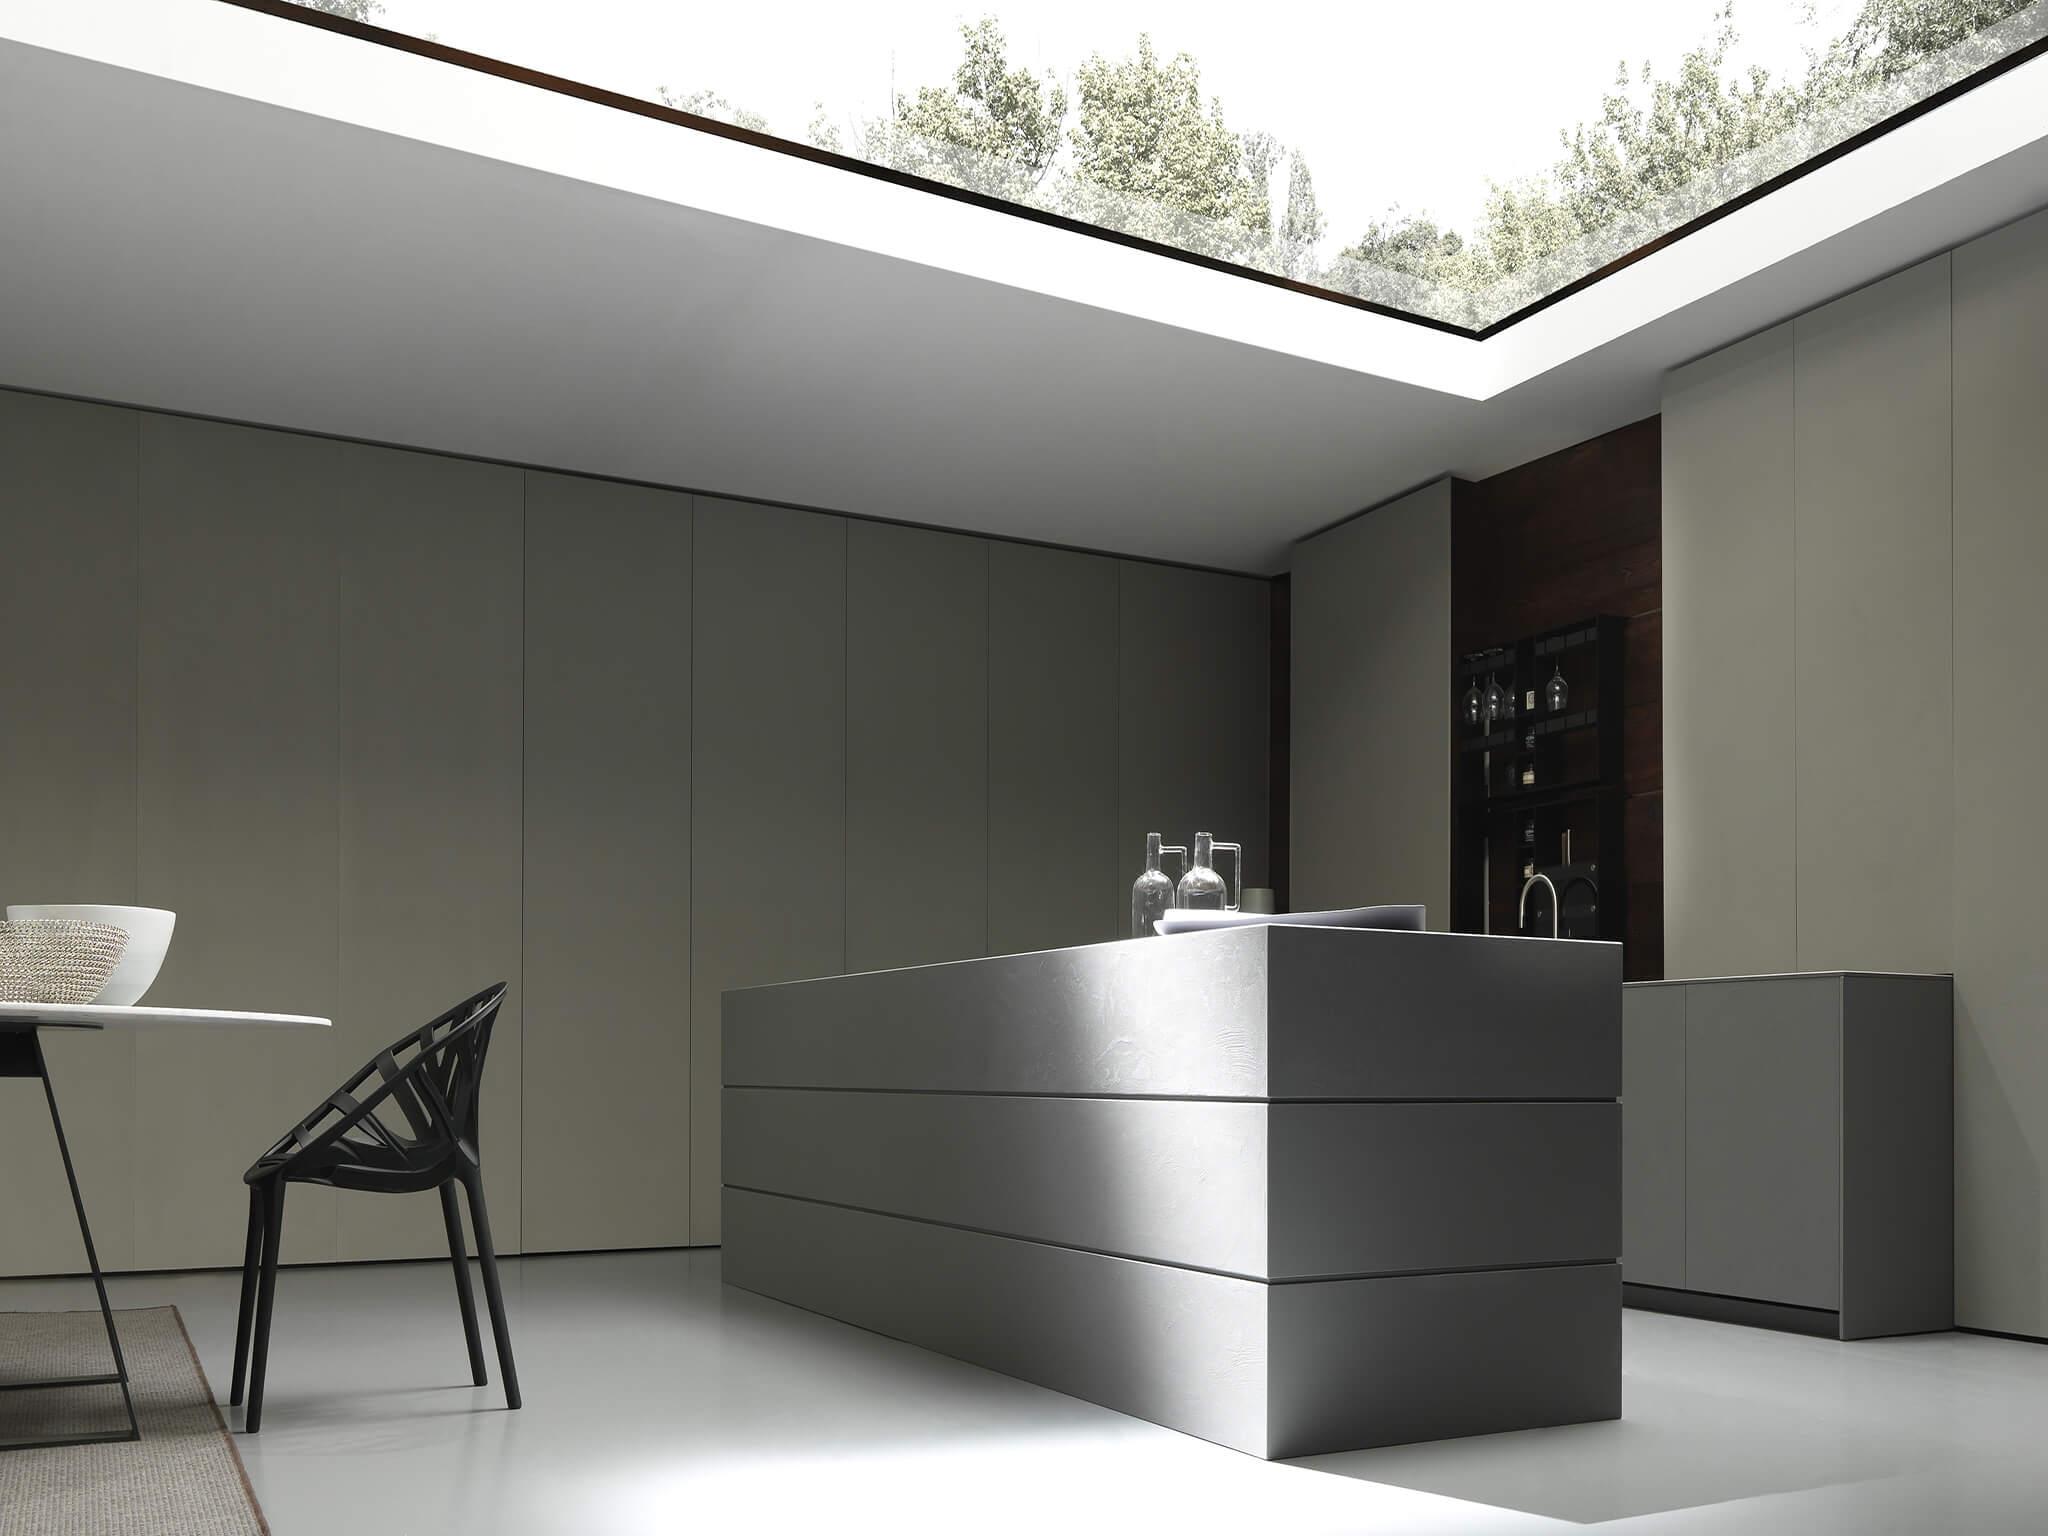 blade kitchen cabinetry archisesto chicago